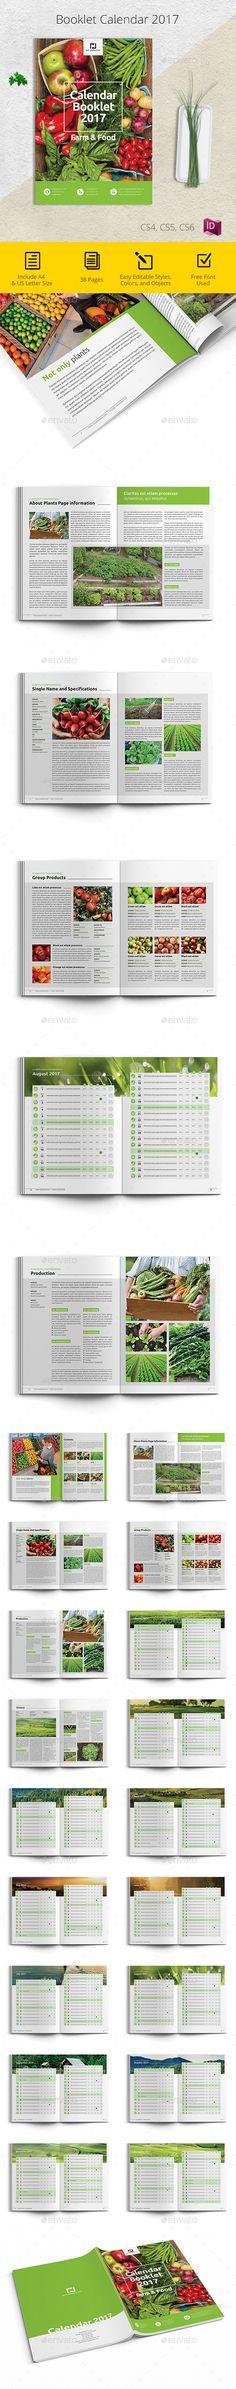 2017 Calendar Farm & Food Brochure Template InDesign INDD. Download here: https://graphicriver.net/item/2017-calendar-farm-food/17436641?ref=ksioks